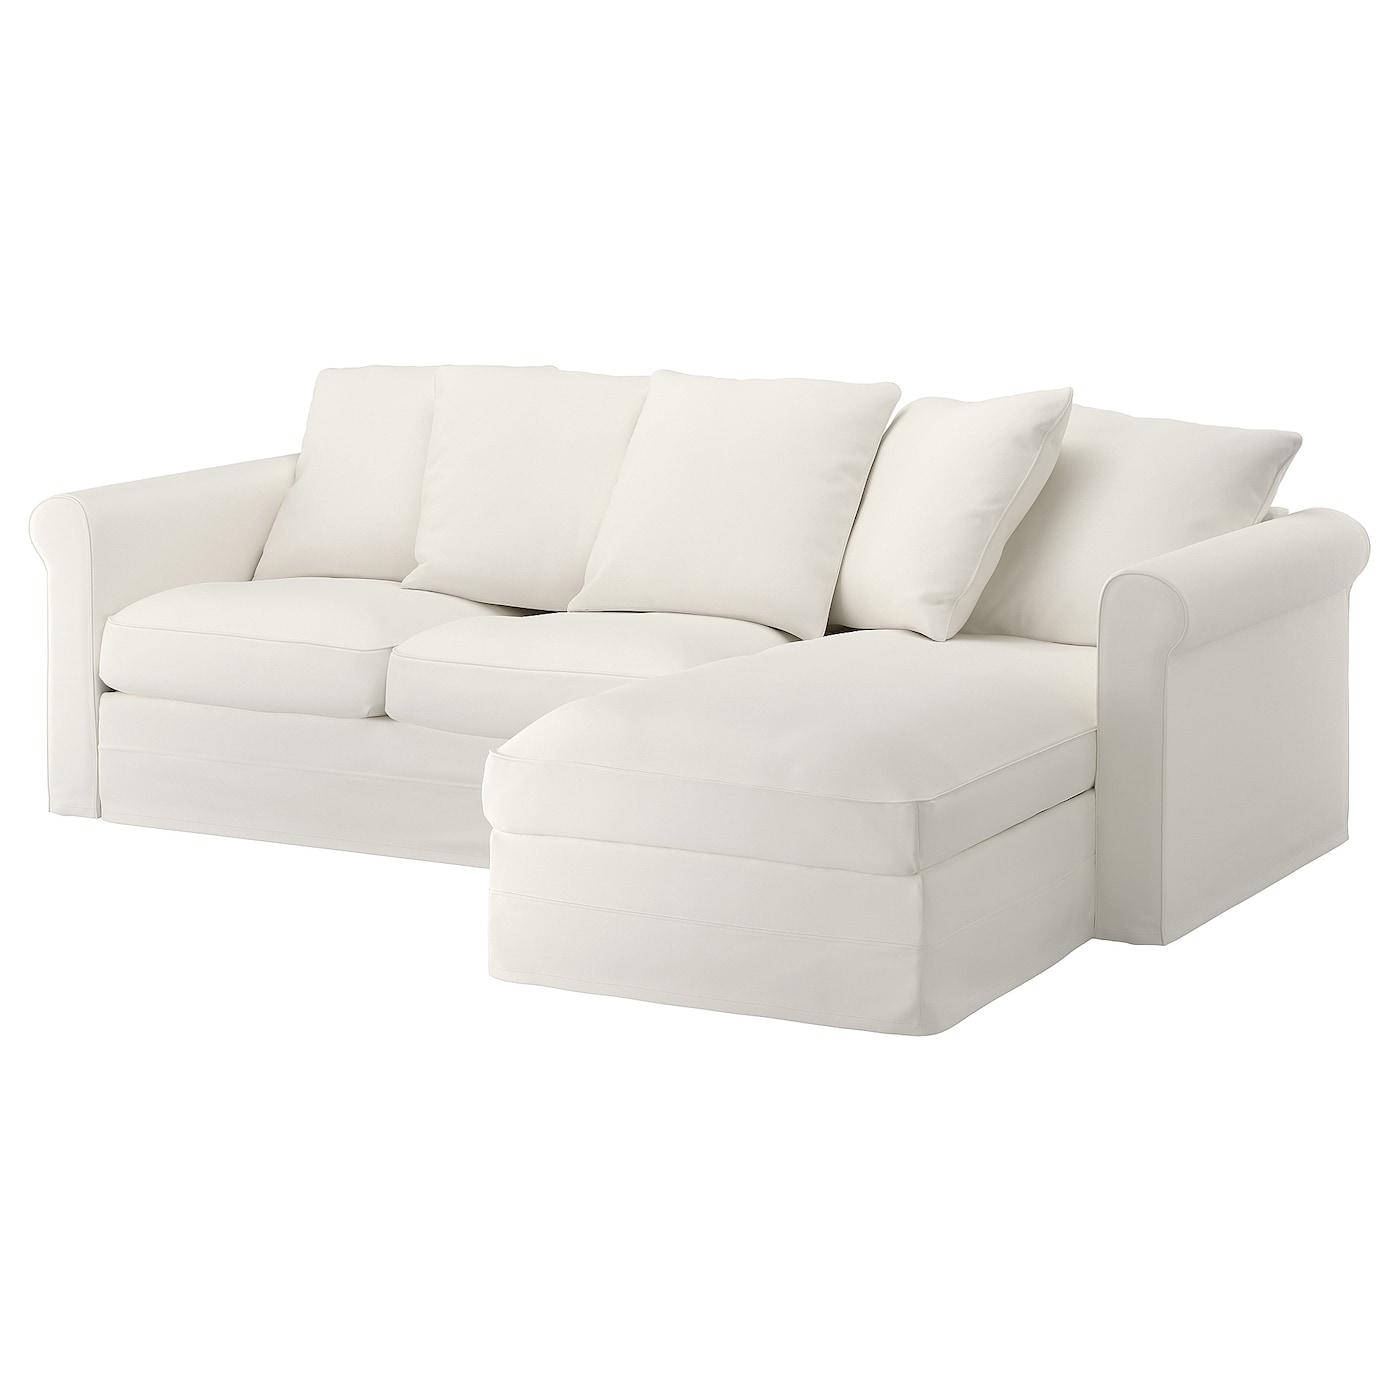 Grönlid Funda Para Sofá De 3 Plazas Chaiselongueinseros Blanco Ikea